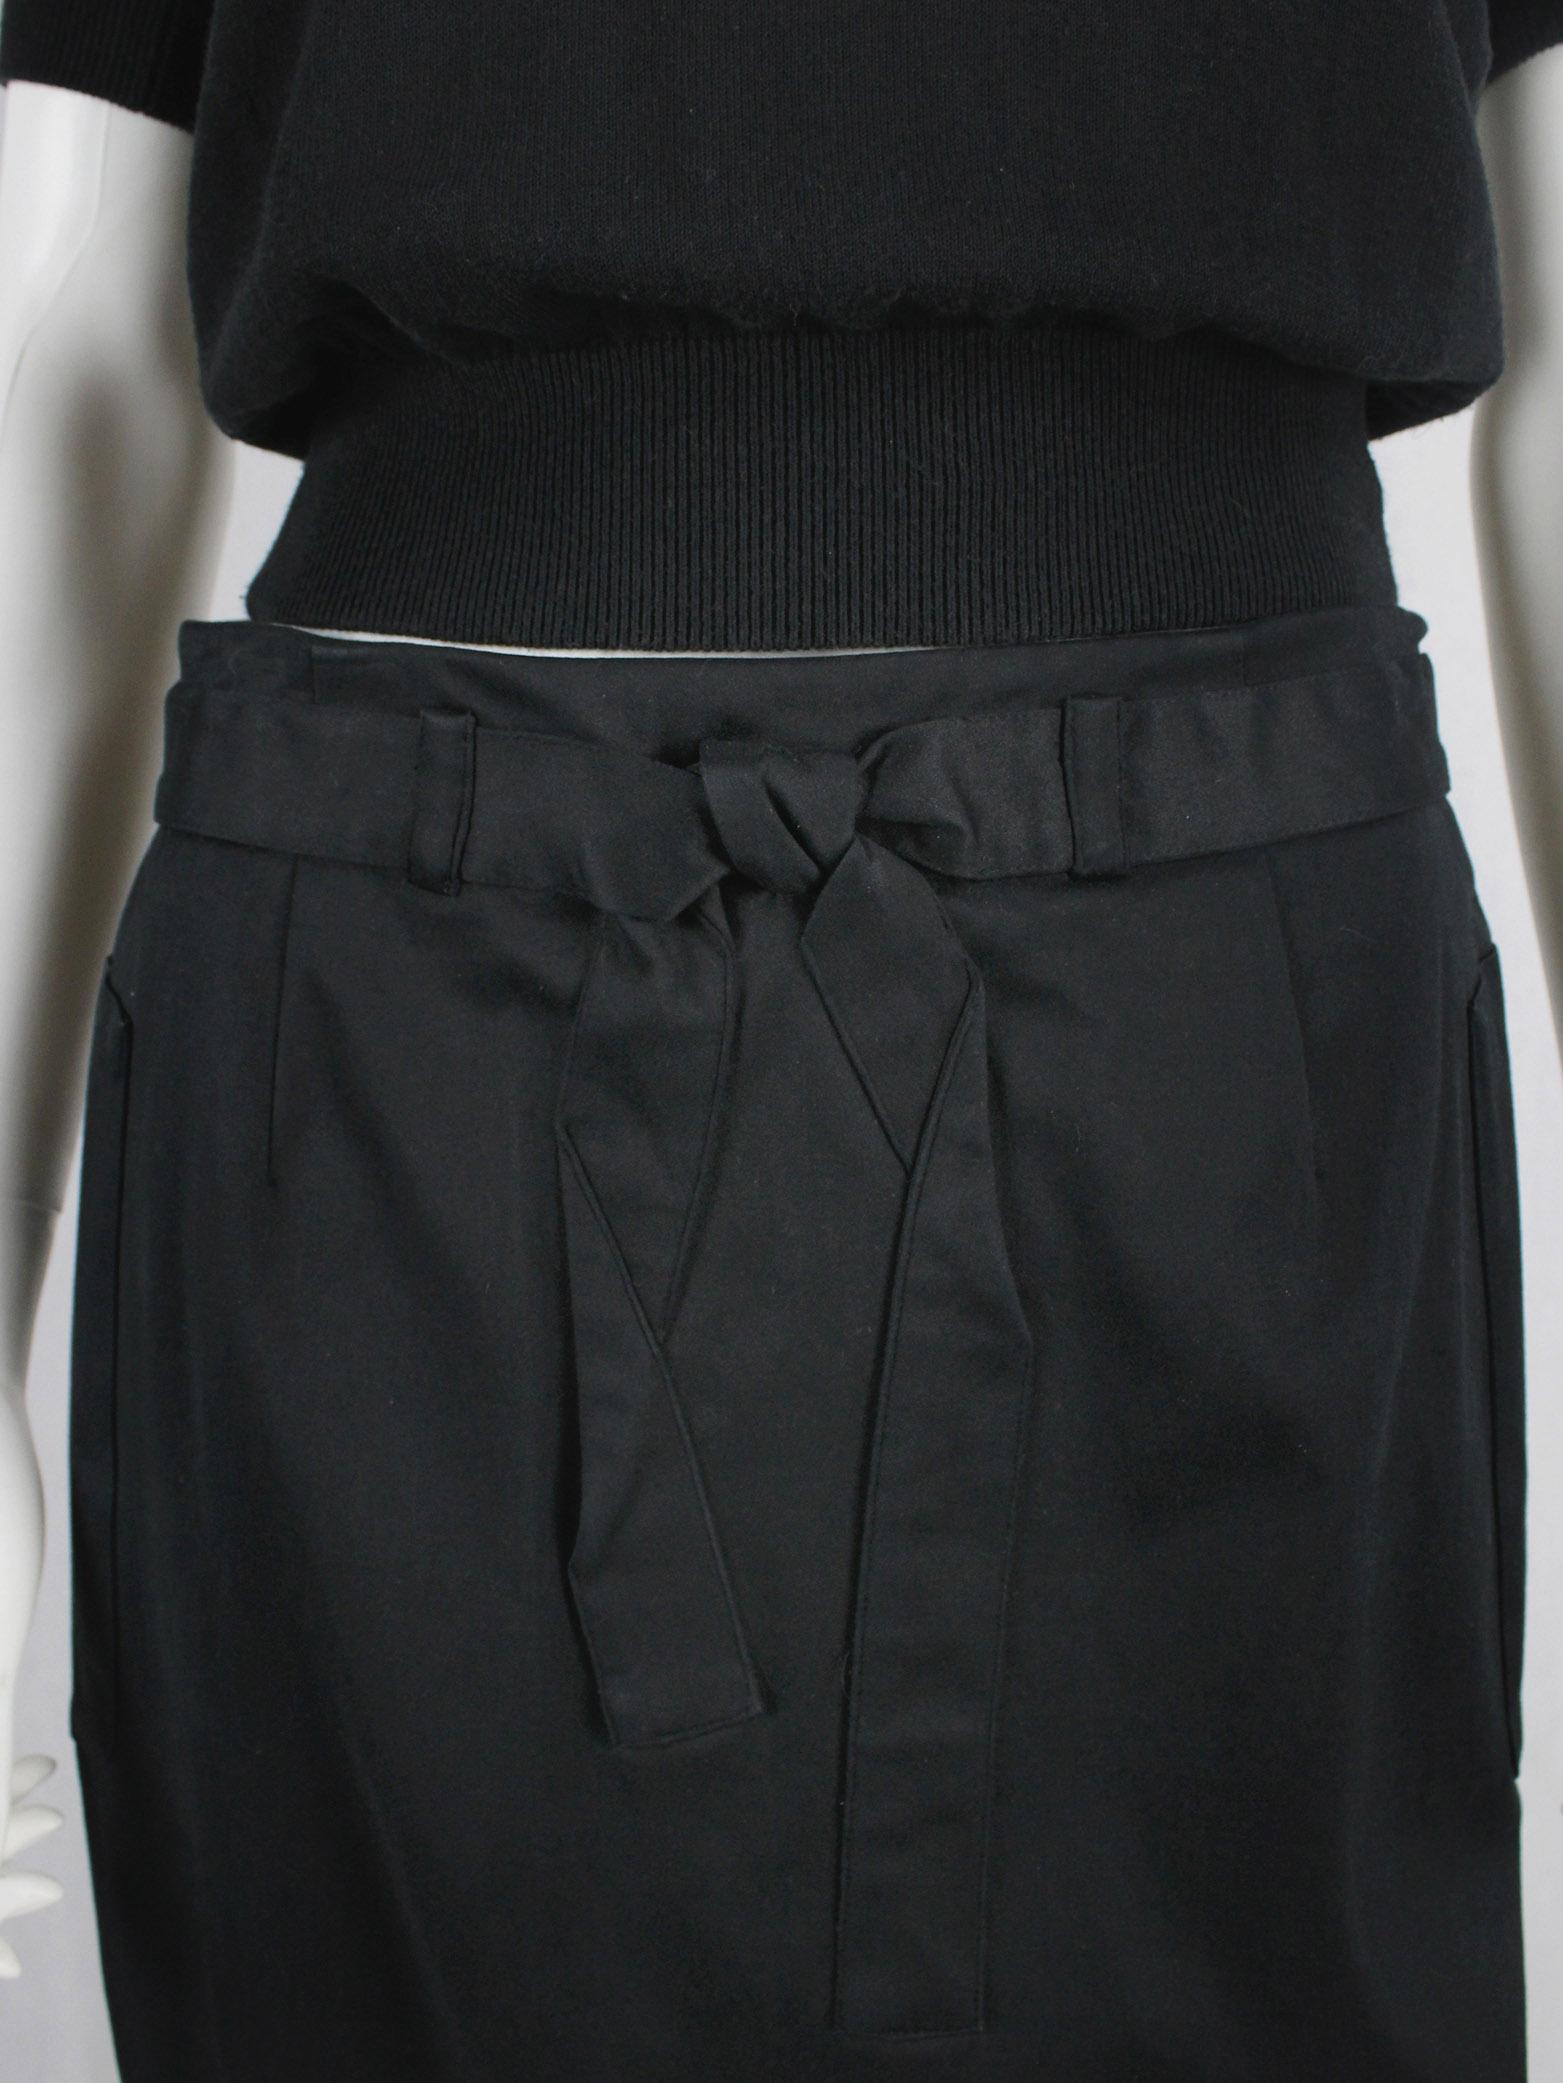 Maison Martin Margiela black maxi skirt with trompe-l'oeil bow — spring 1999